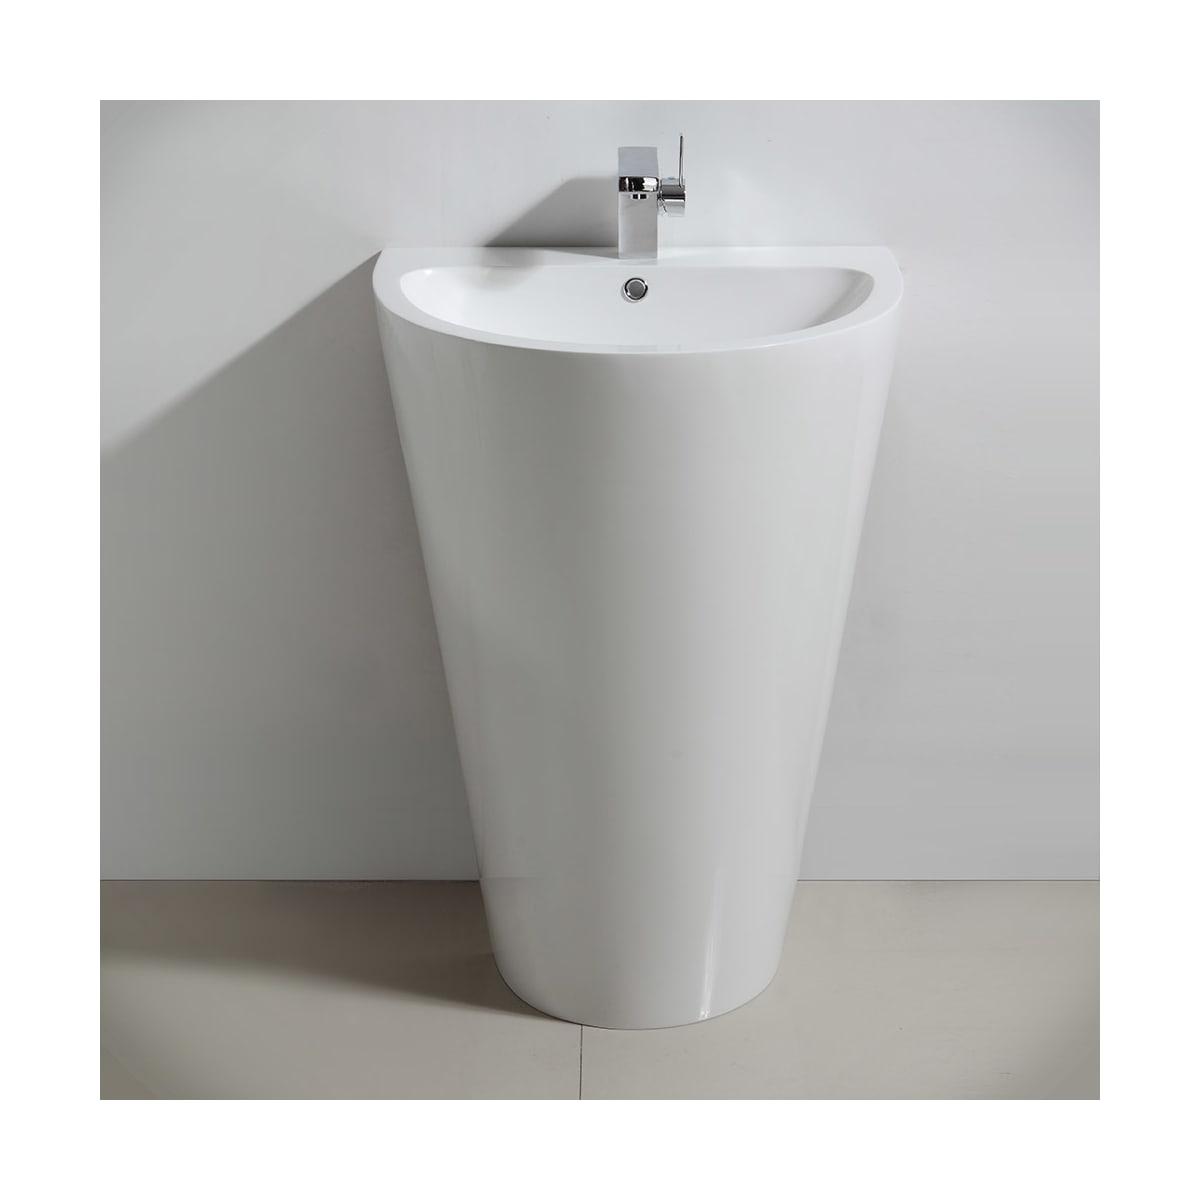 Fresca Fcb5023wh White Parma 24 Pedestal Bathroom Sink With Single Faucet Hole And Overflow Faucet Com